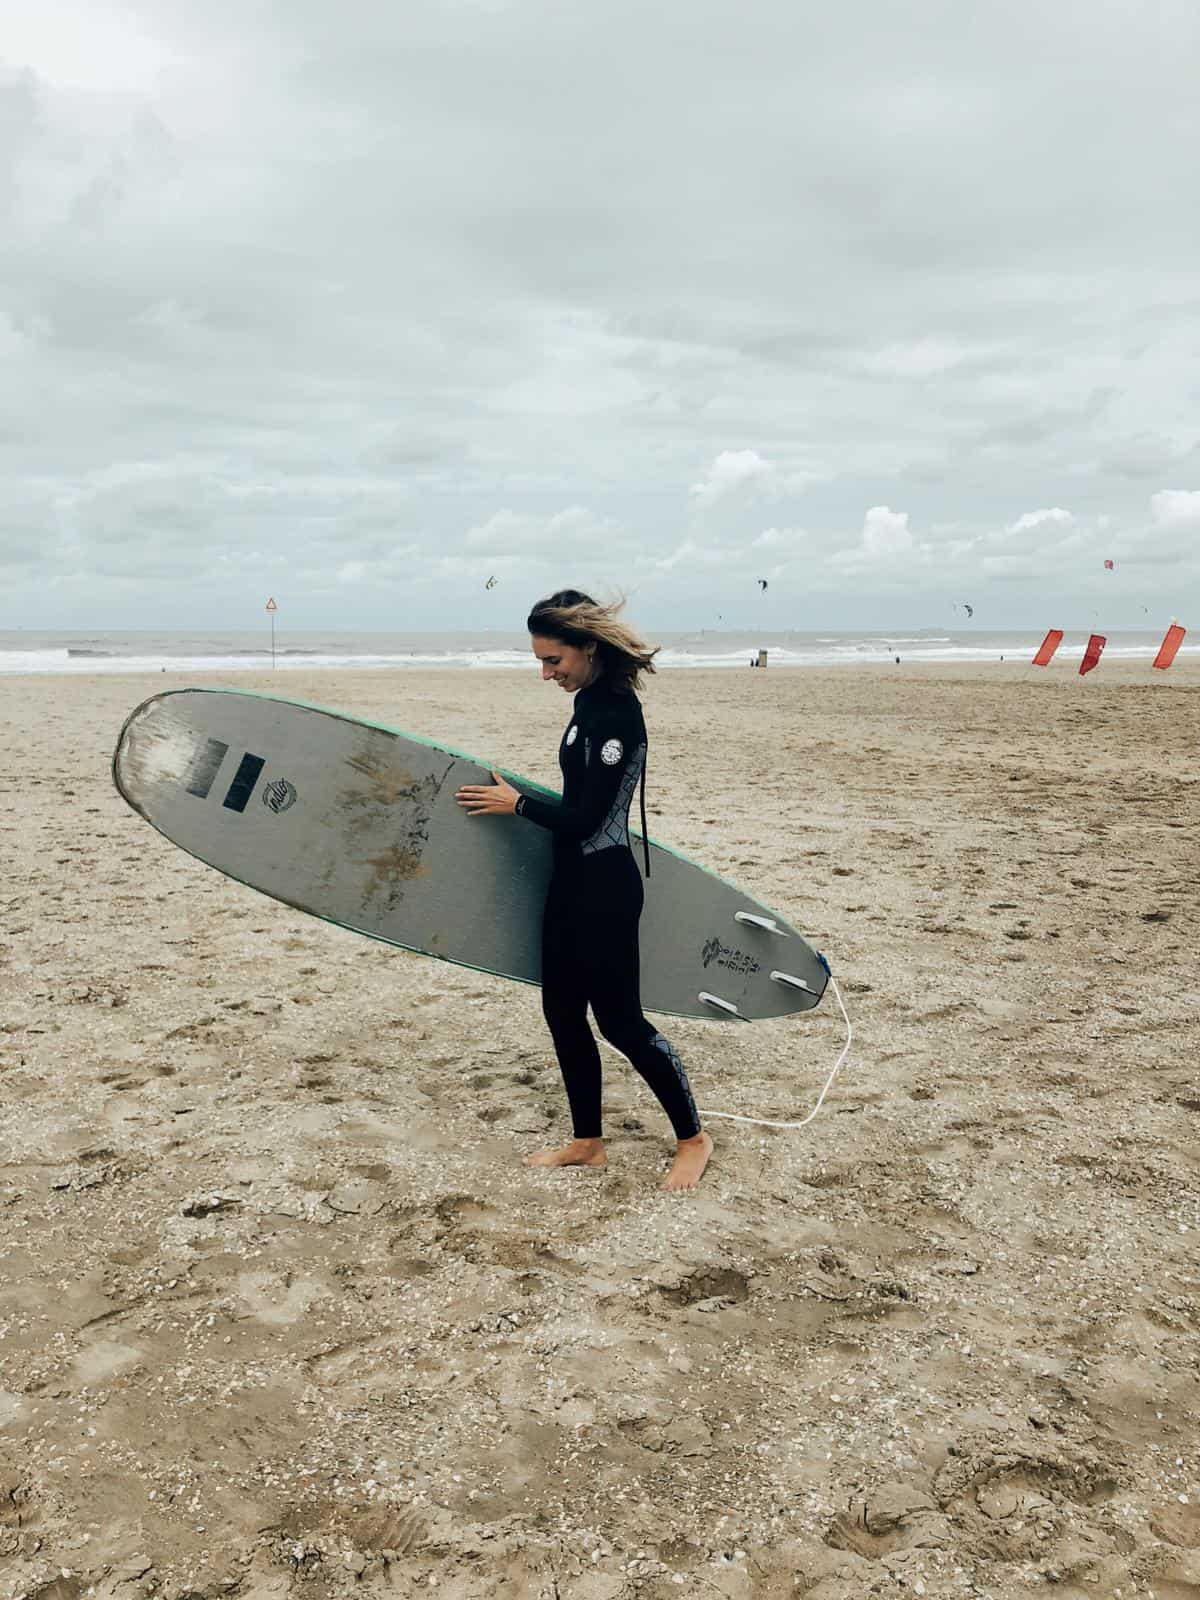 Beginnen met surfen in Nederland: tips & tricks